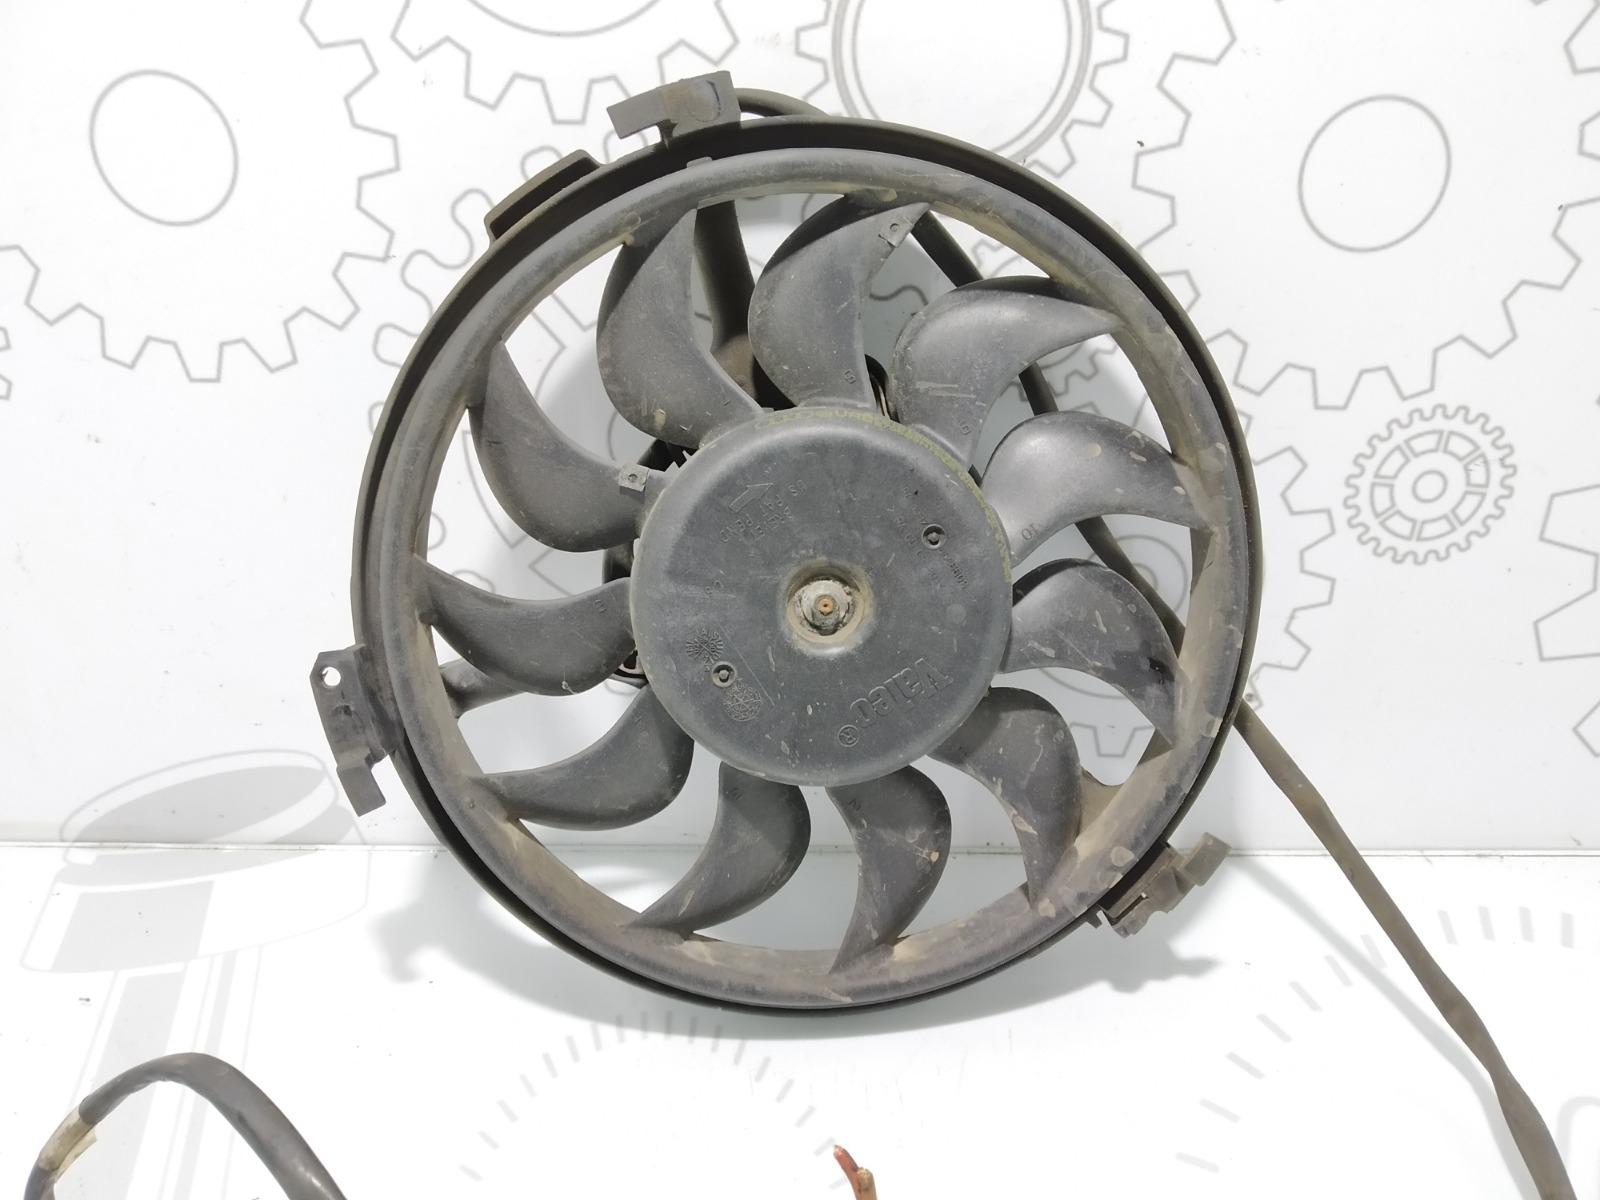 Вентилятор радиатора Volkswagen Passat B5 2.0 I 2002 (б/у)